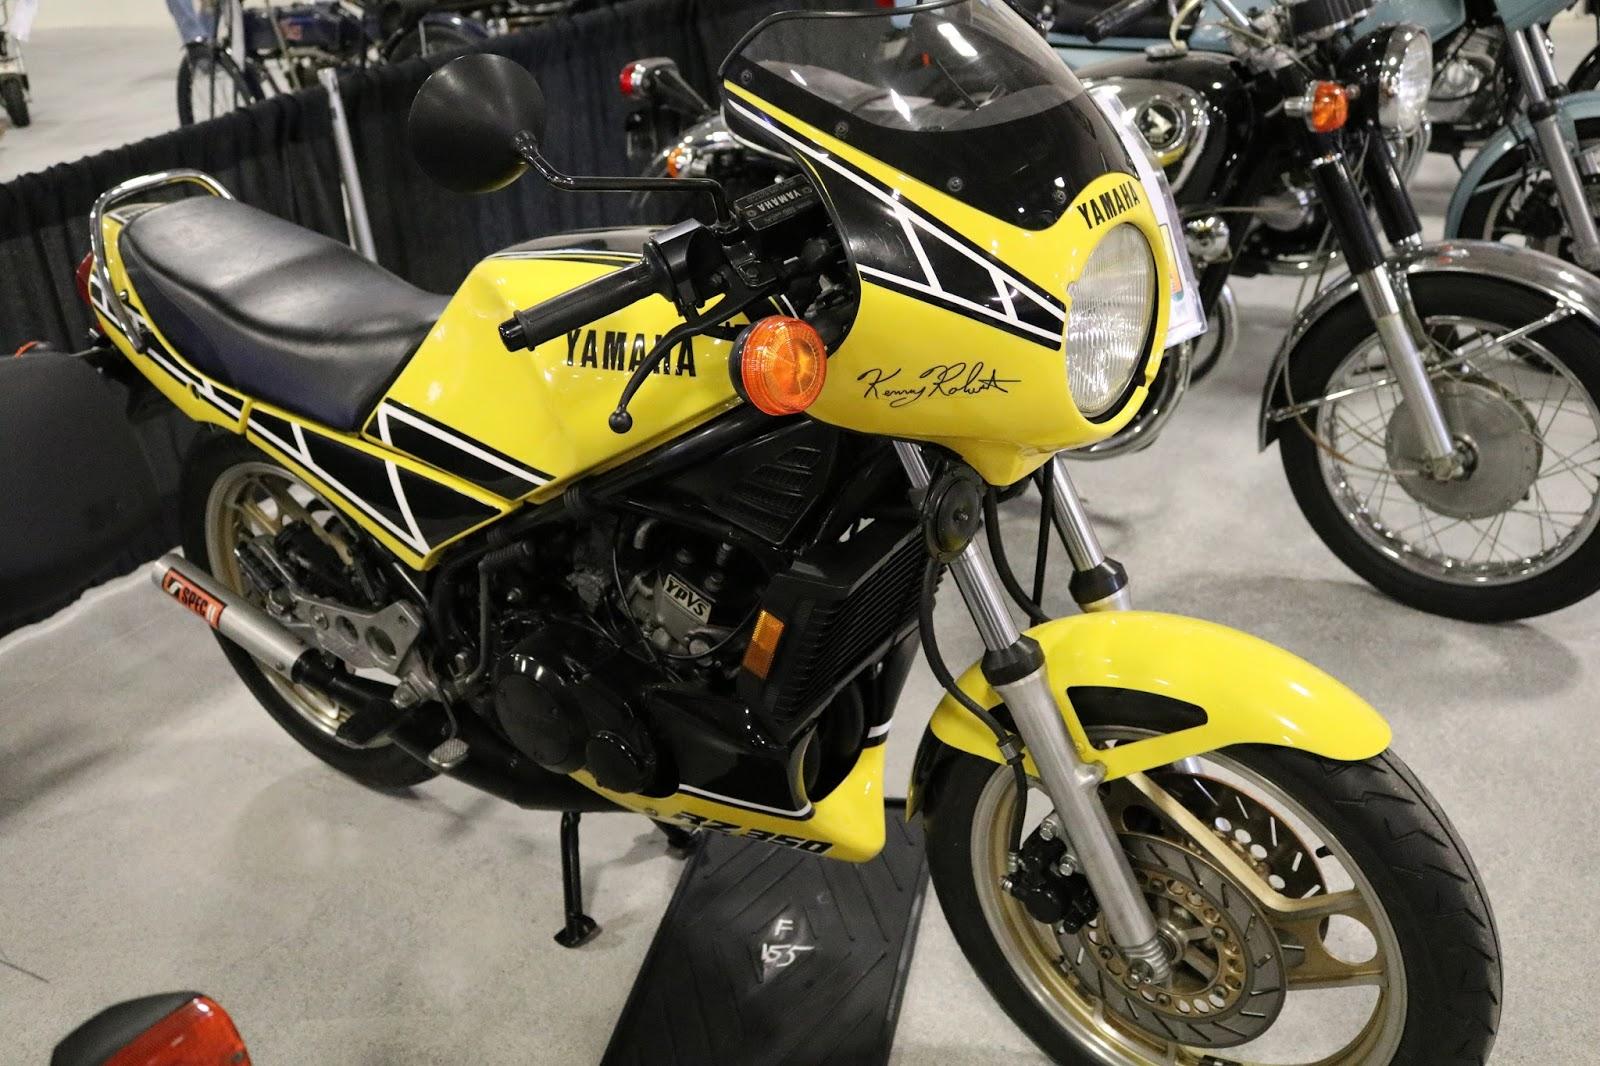 Oldmotodude 1984 yamaha rz350 sold for 6 000 at the 2017 for Yamaha of las vegas